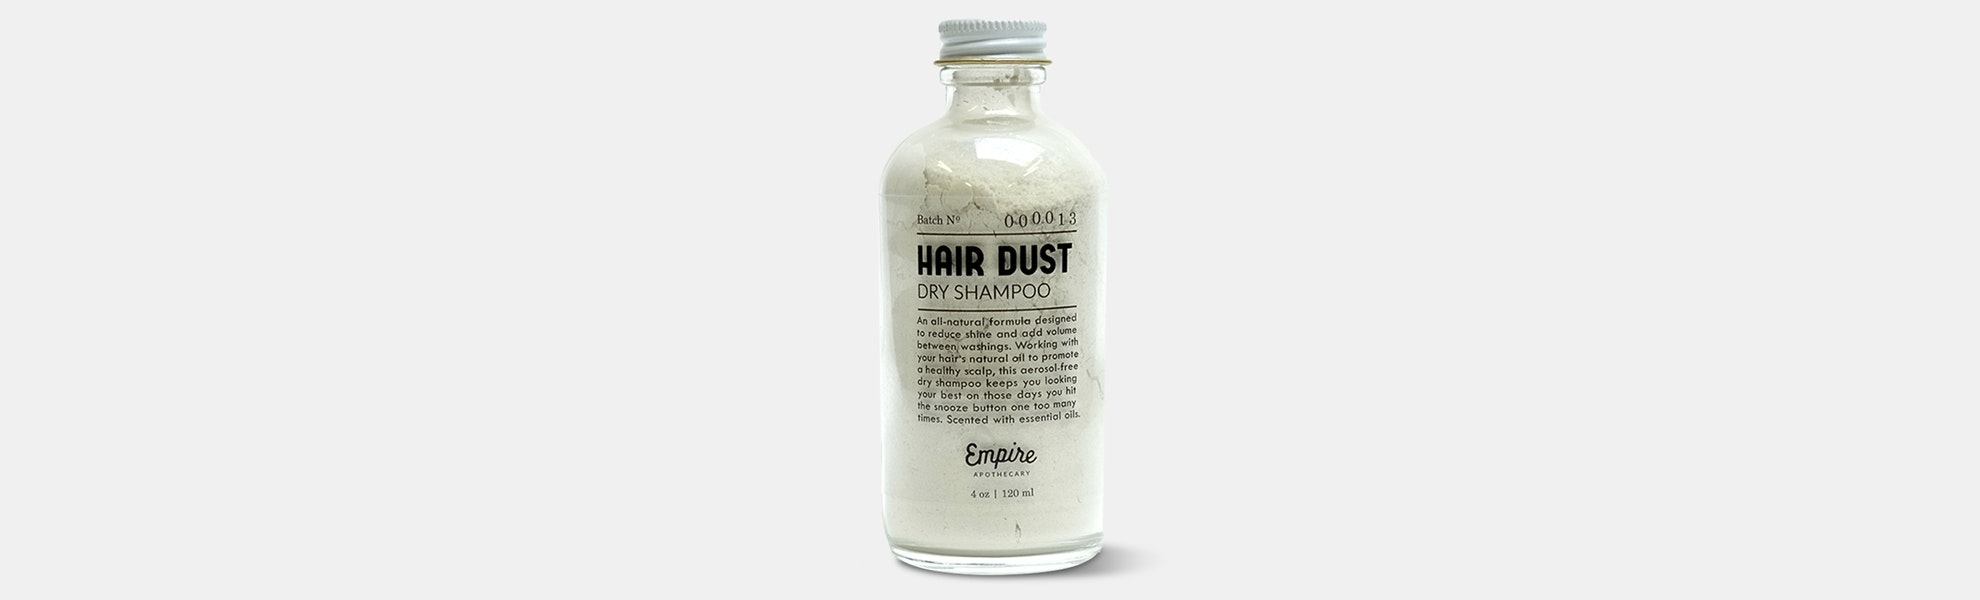 Empire Apothecary Hair Dust Dry Shampoo